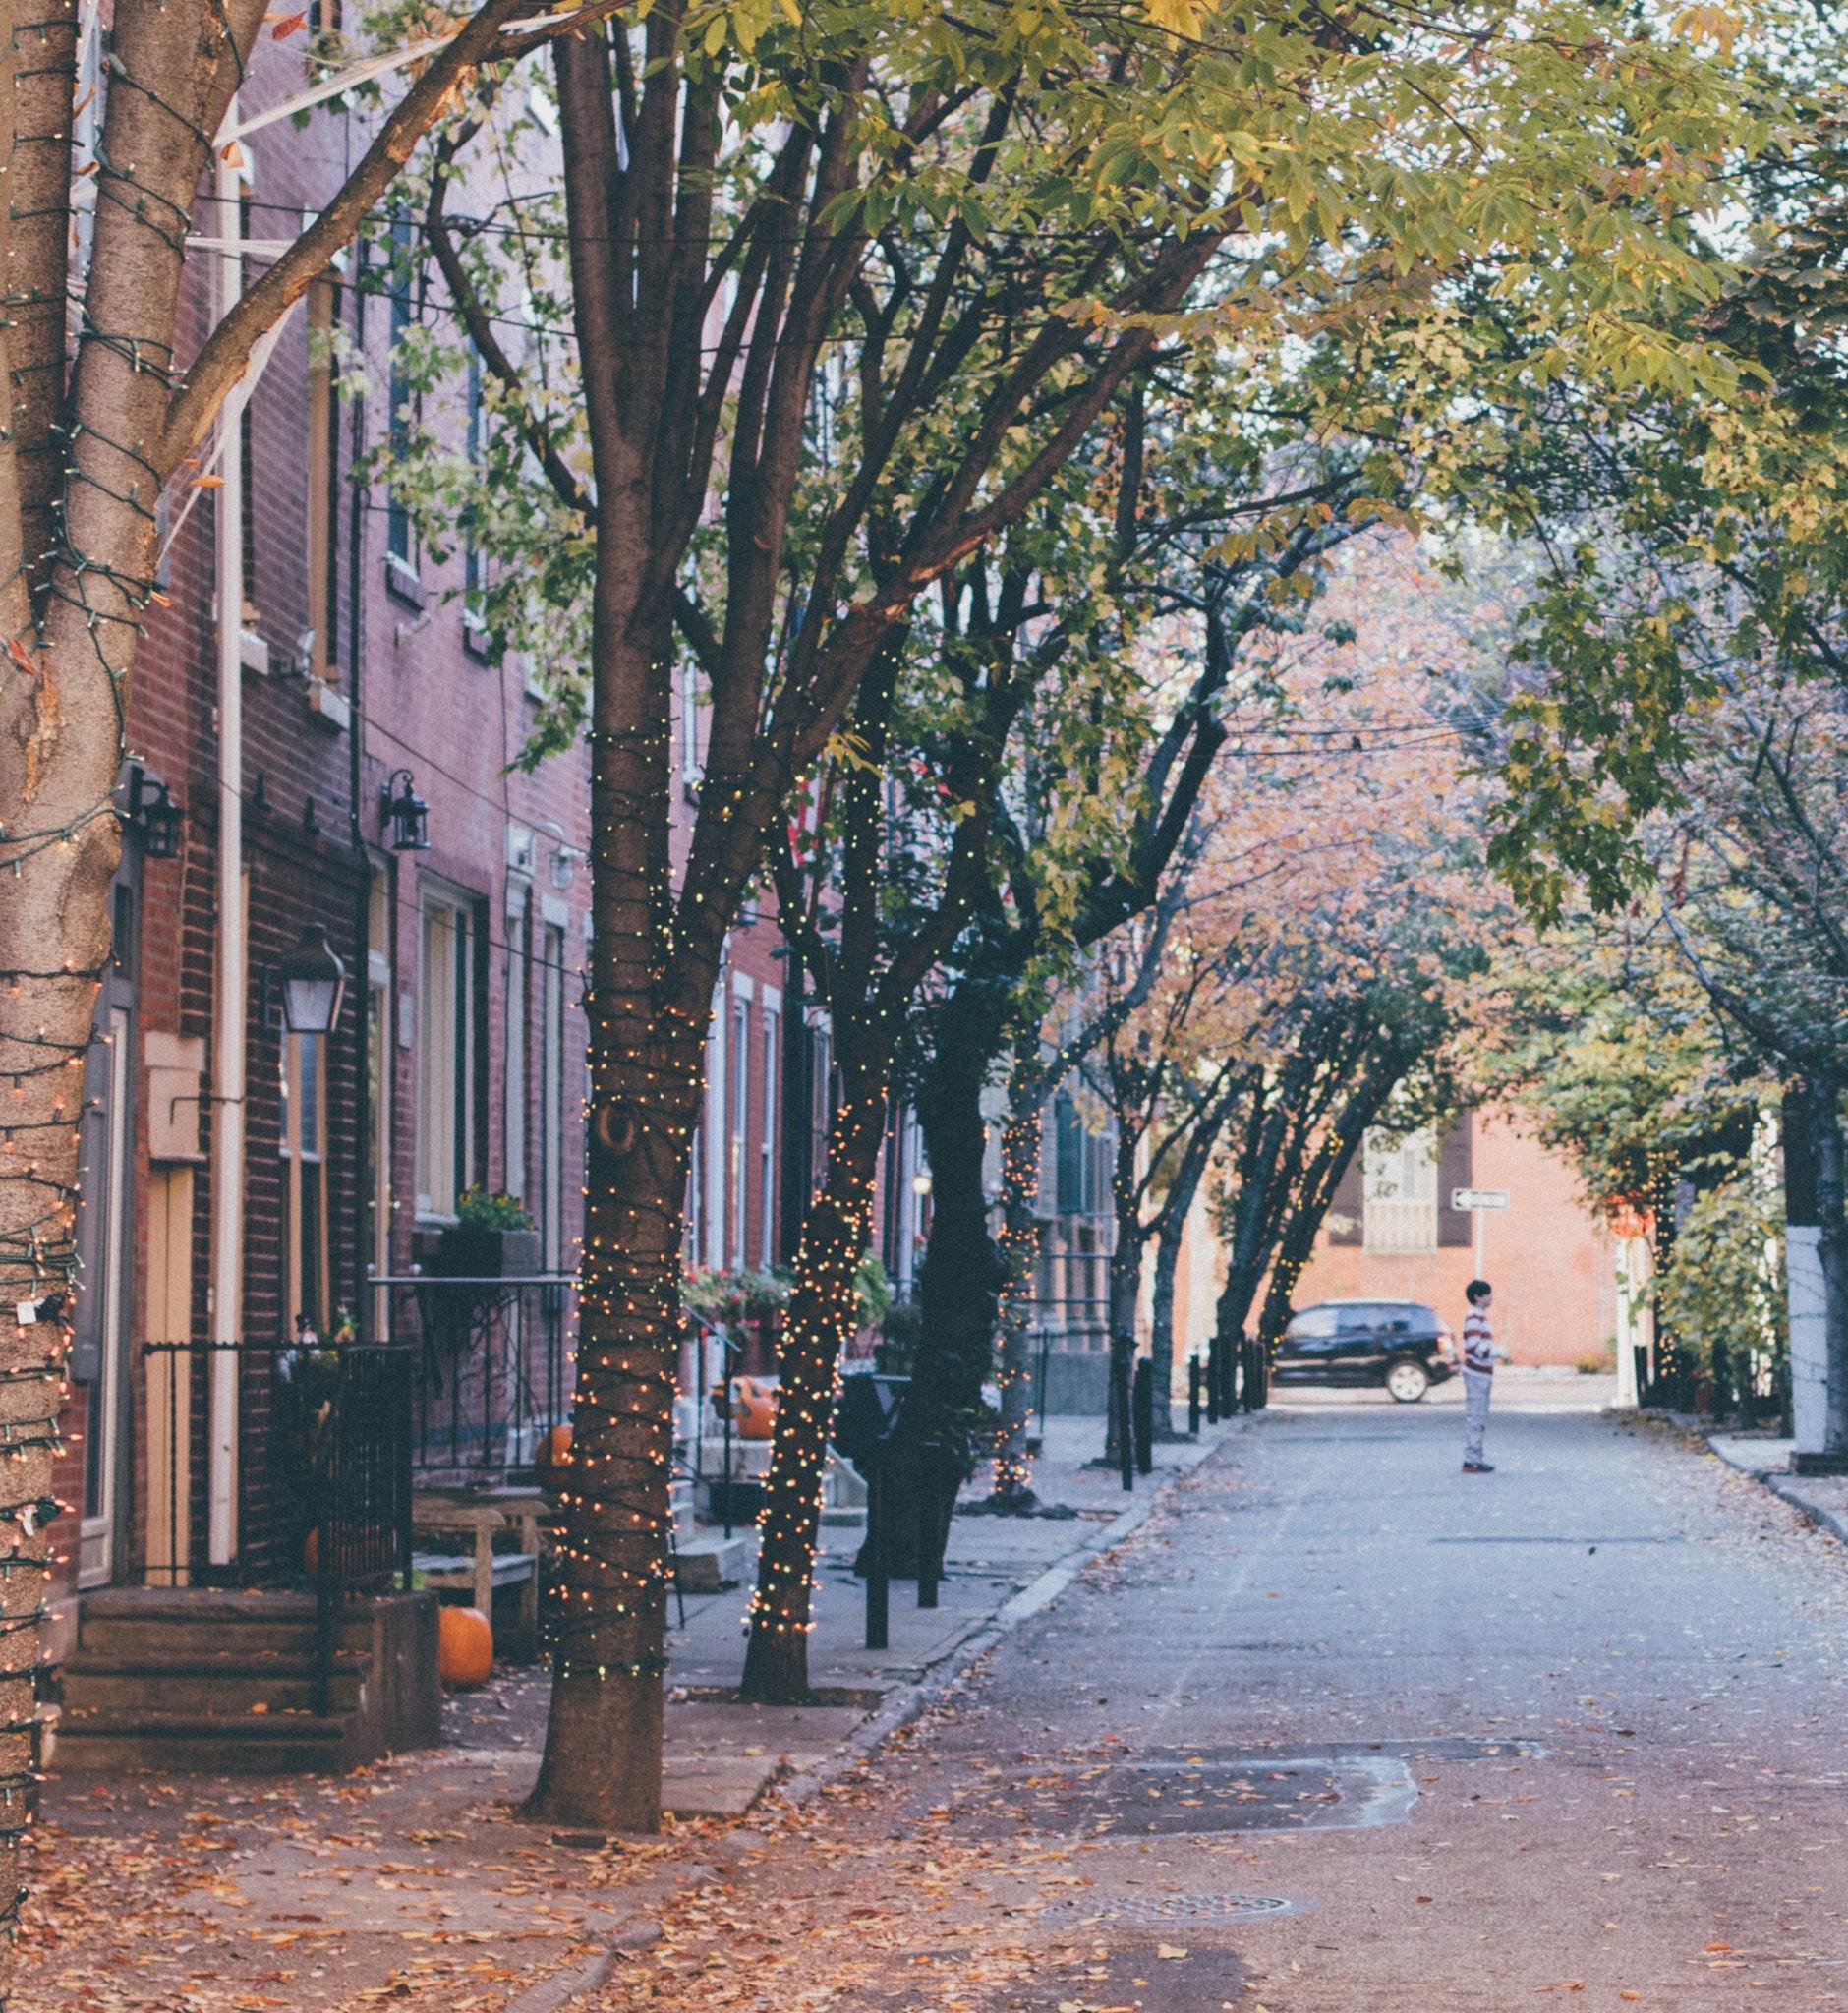 A quaint neighborhood street in Philadelphia.